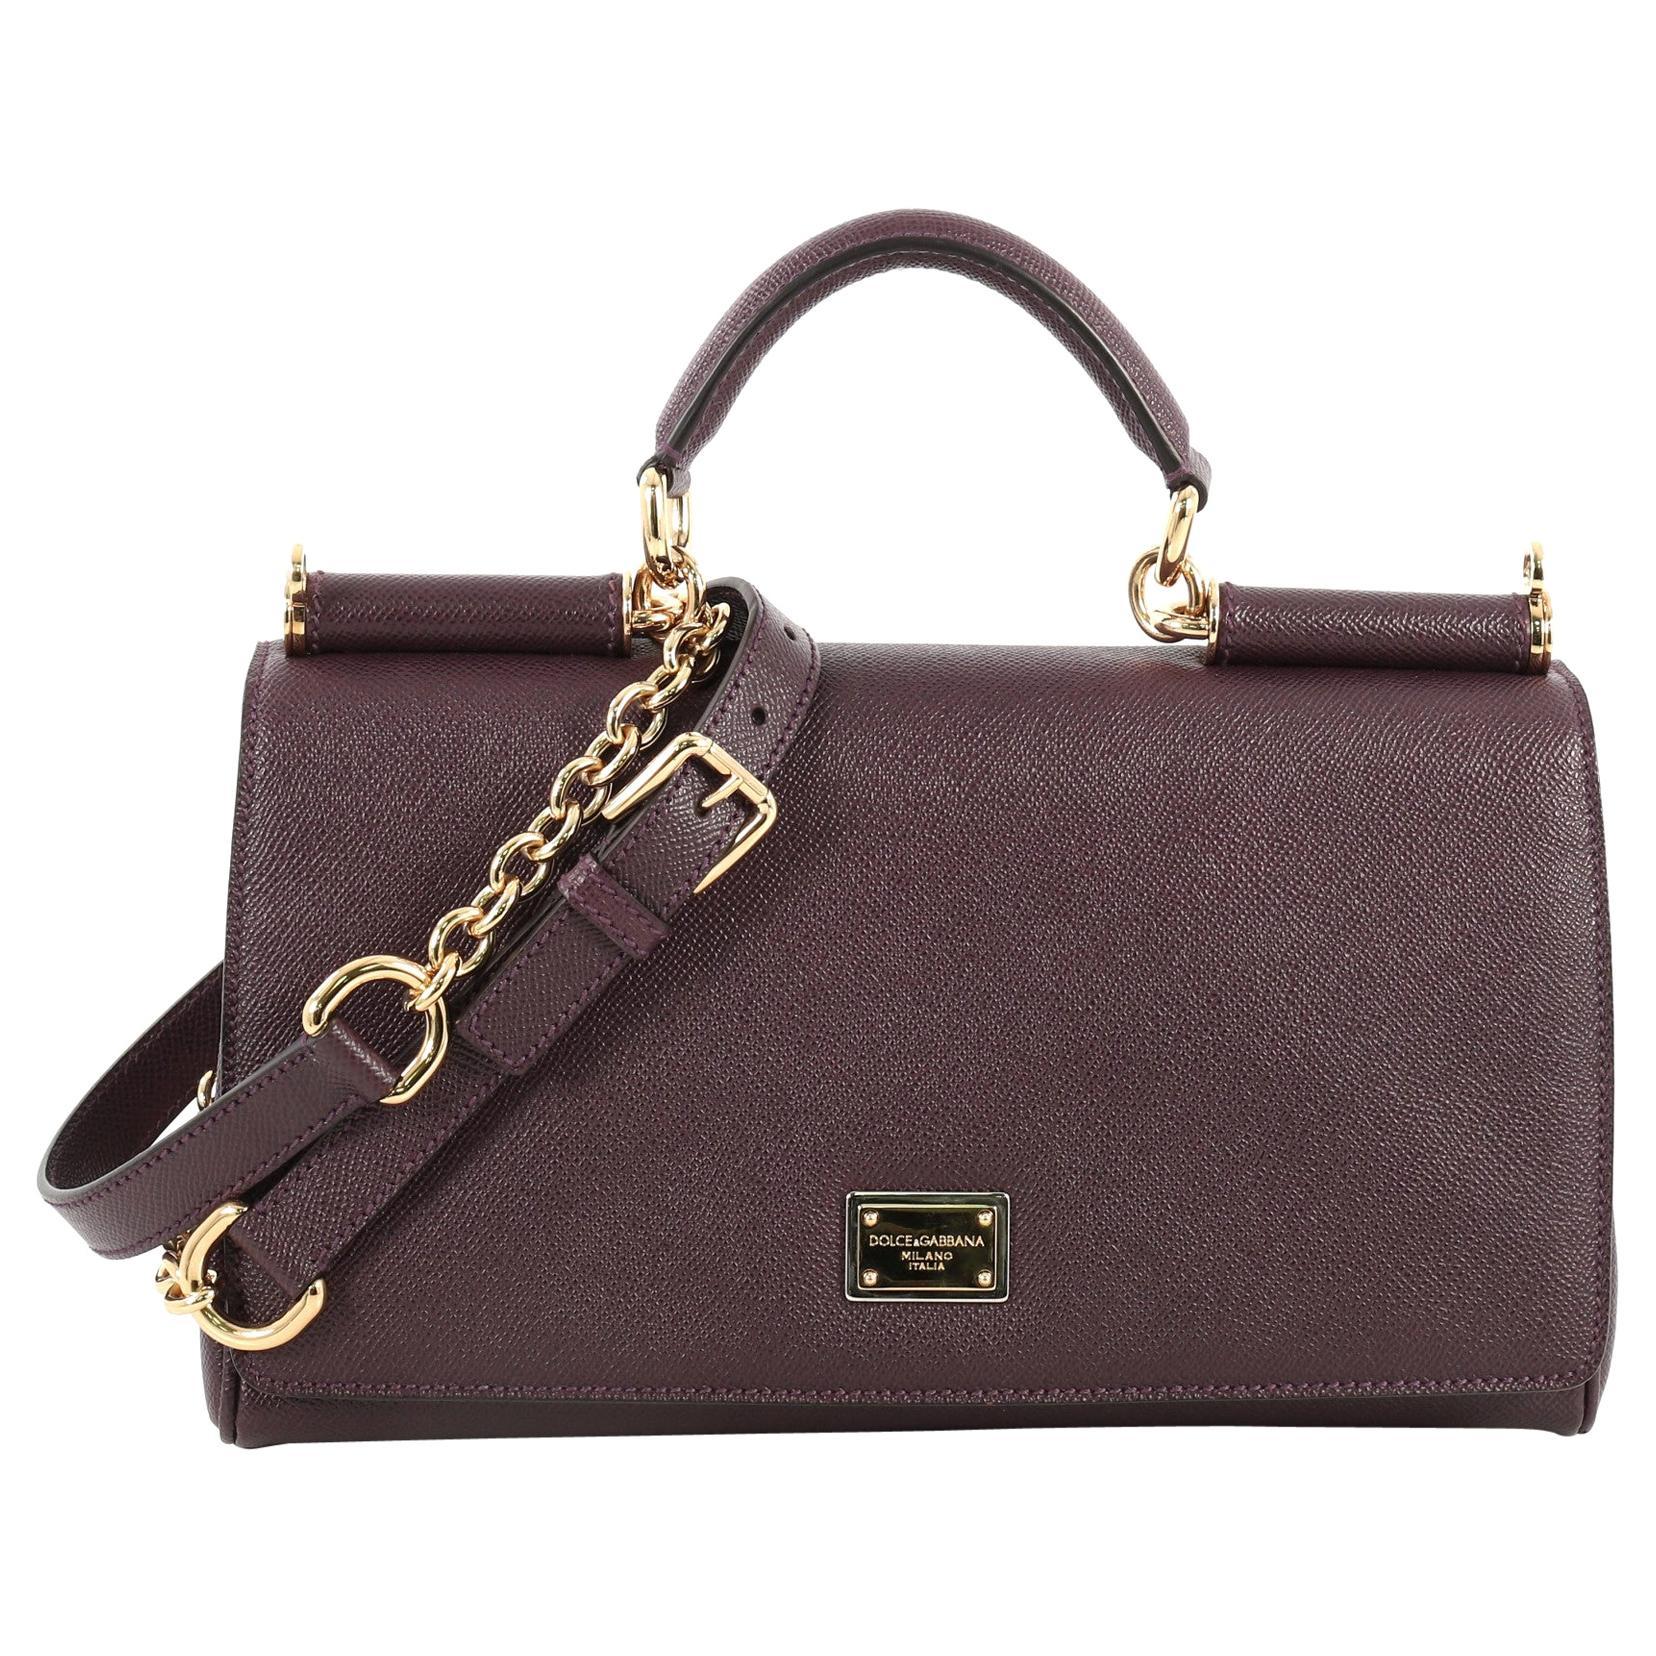 87face1e11edd Vintage Dolce & Gabbana Handbags and Purses - 212 For Sale at 1stdibs